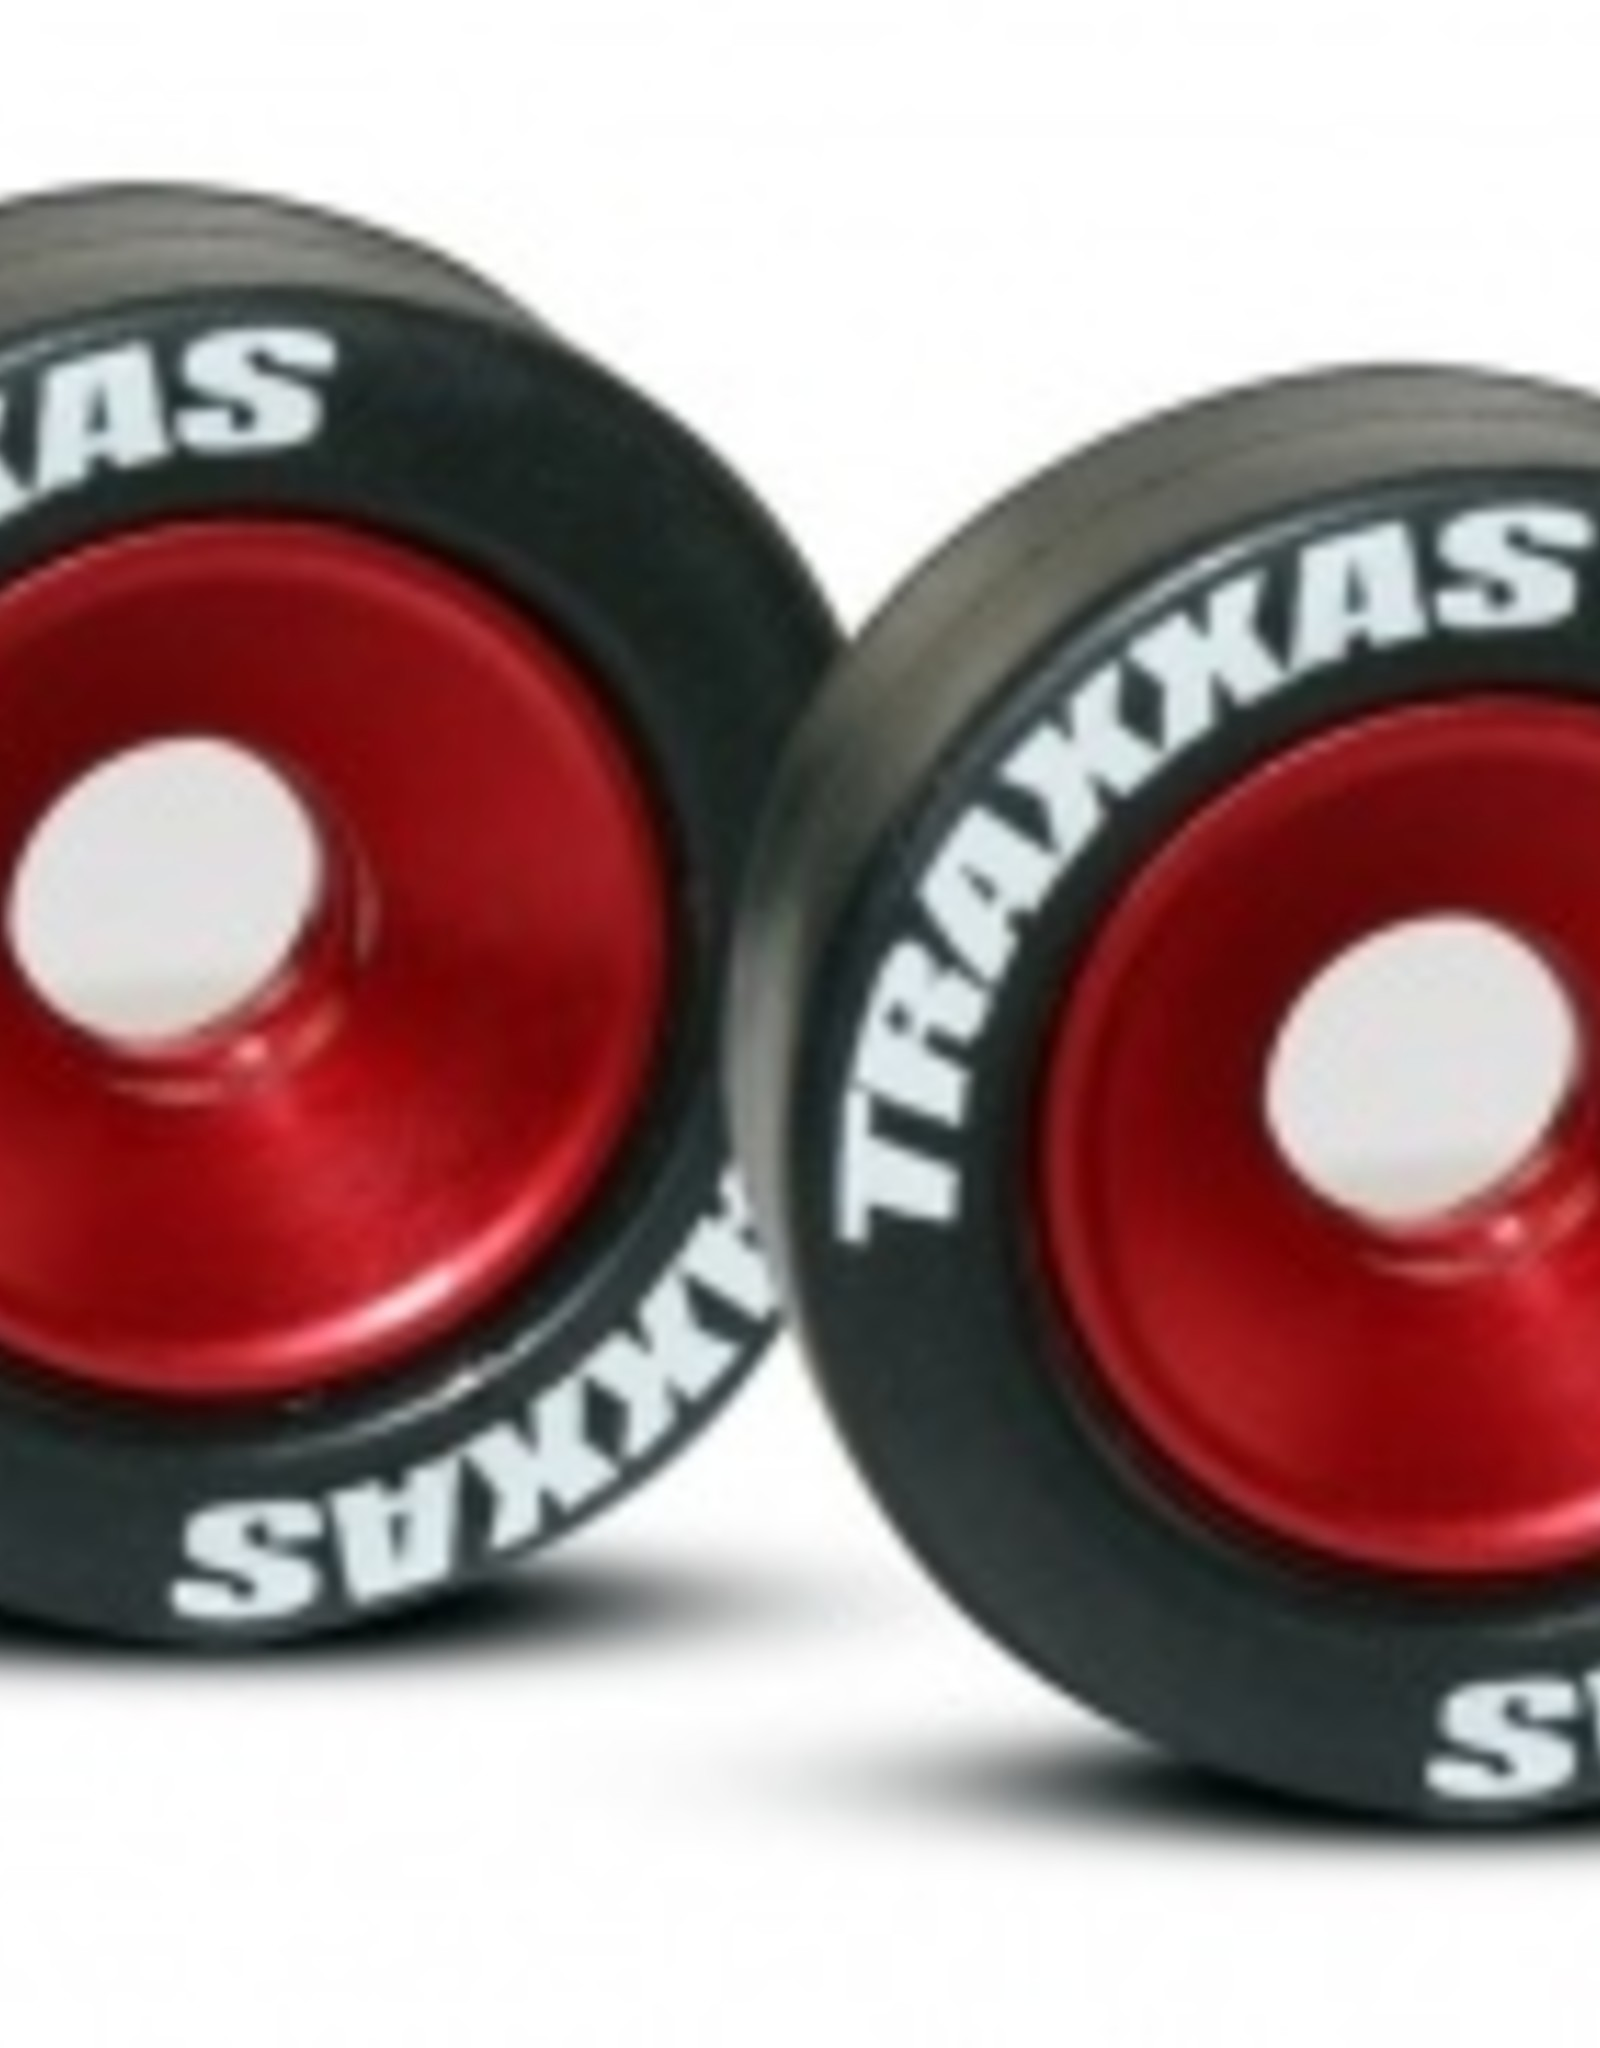 Traxxas Traxxas Wheels, aluminum (red-anodized) (2)/ 5x8mm ball bearings (4)/ axles (2)/ rubber tires (2)